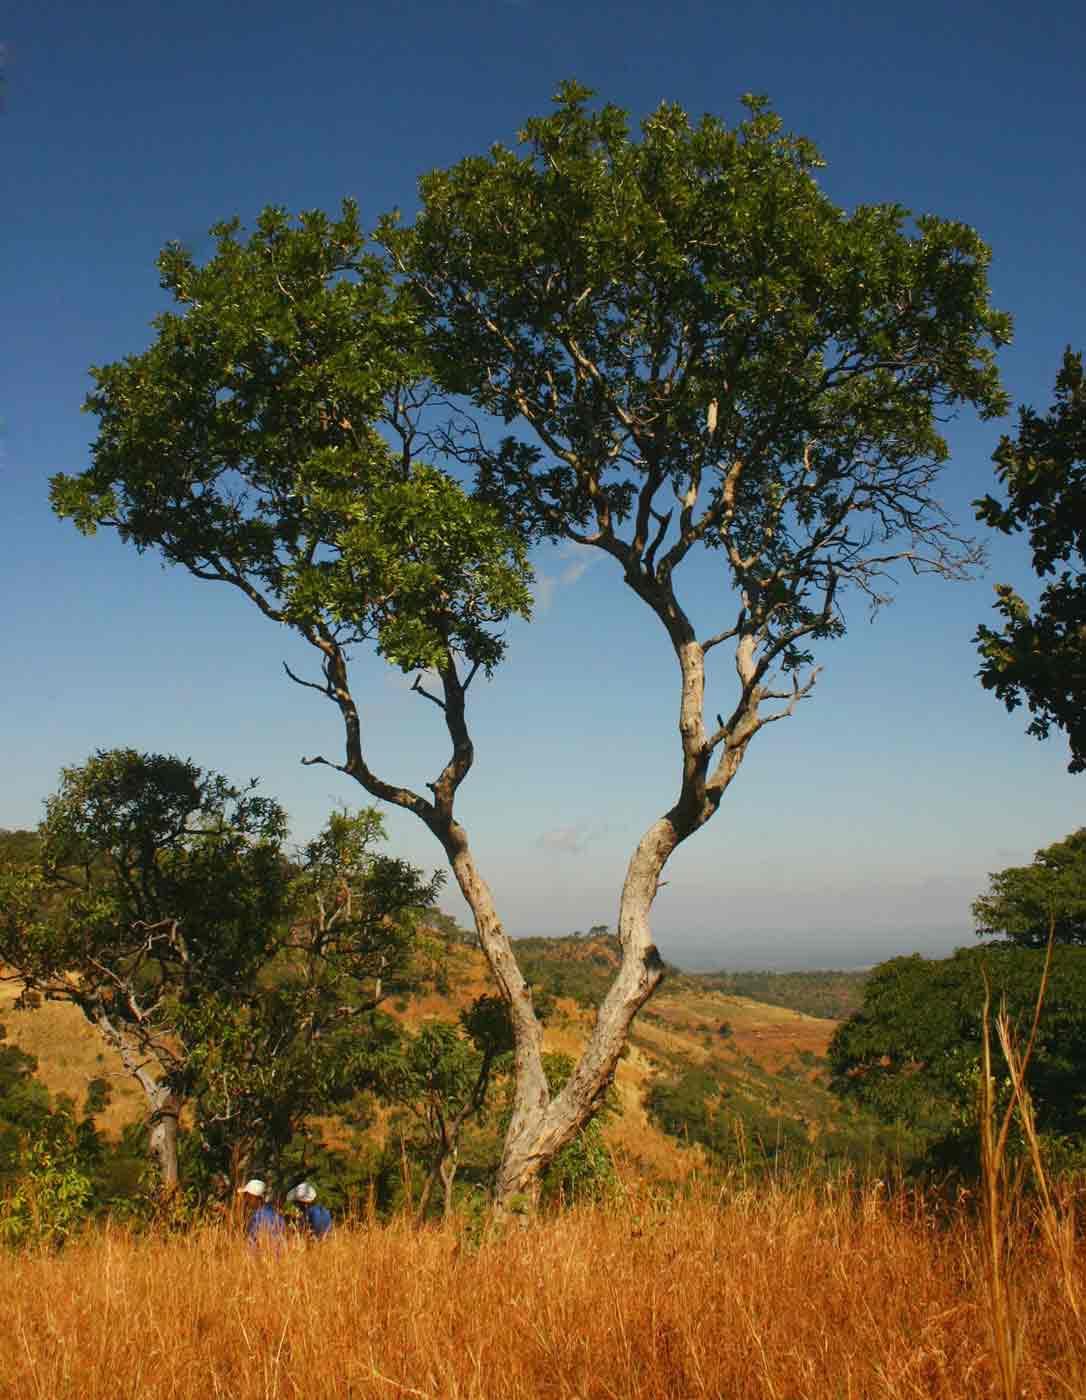 Pericopsis angolensis